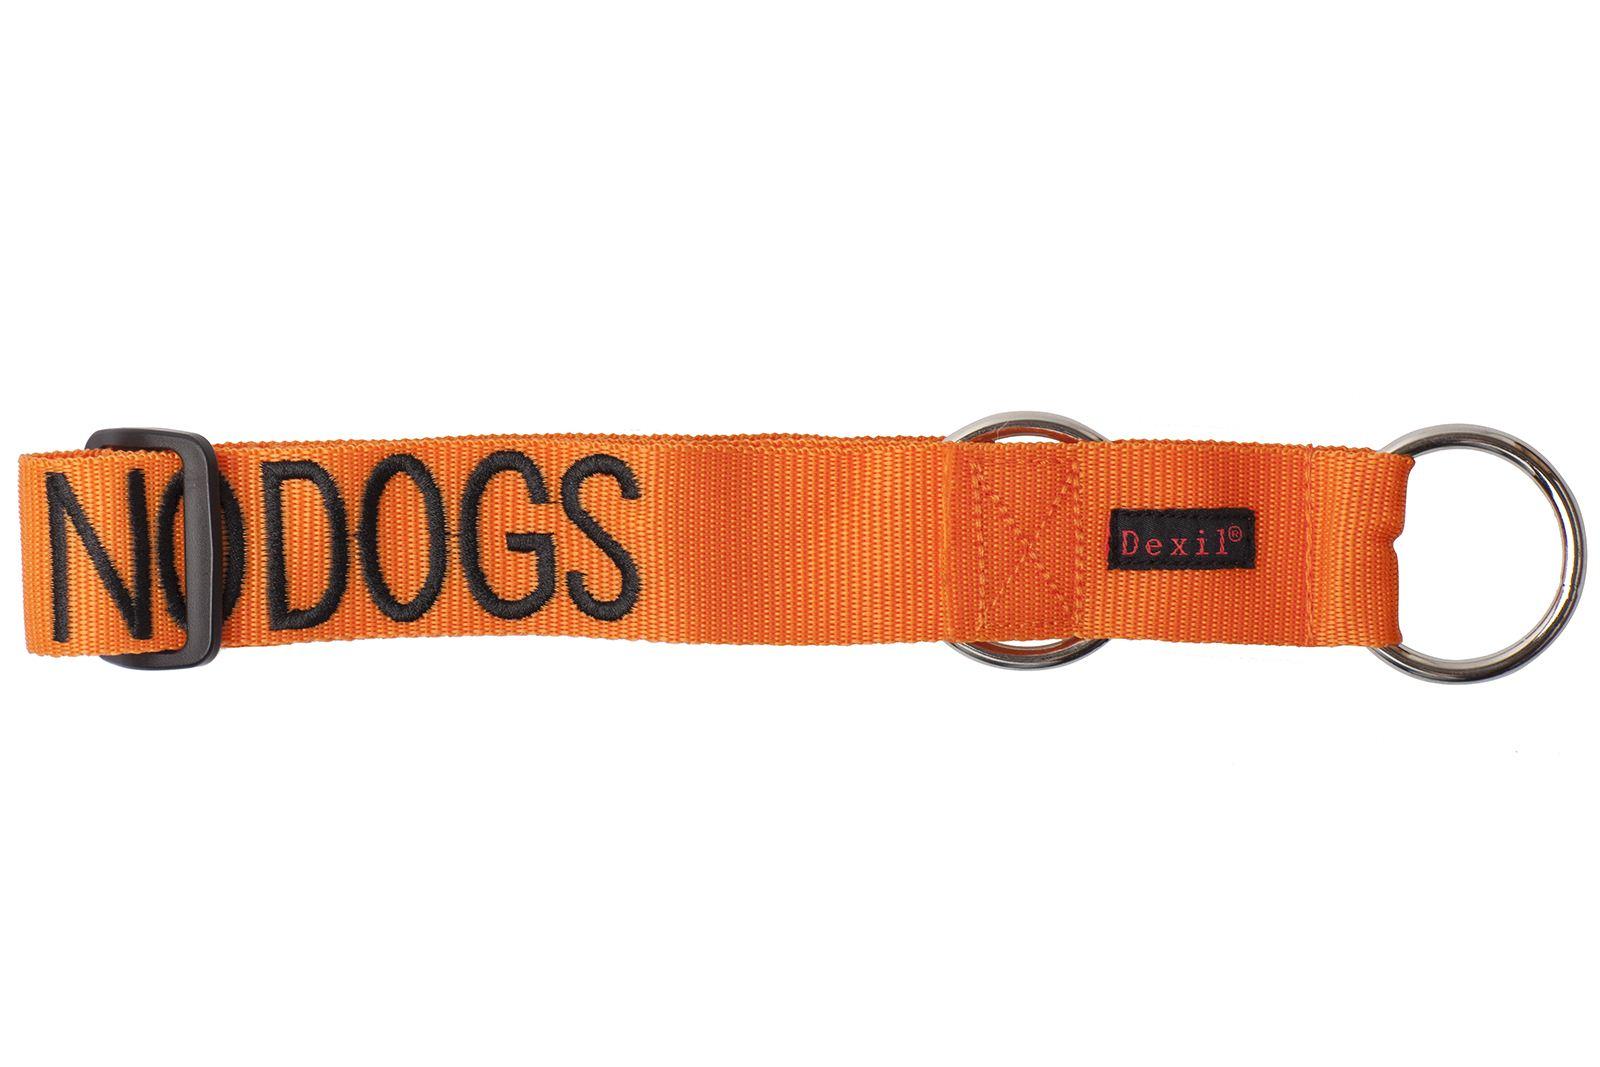 Blind And Deaf Dog Collar